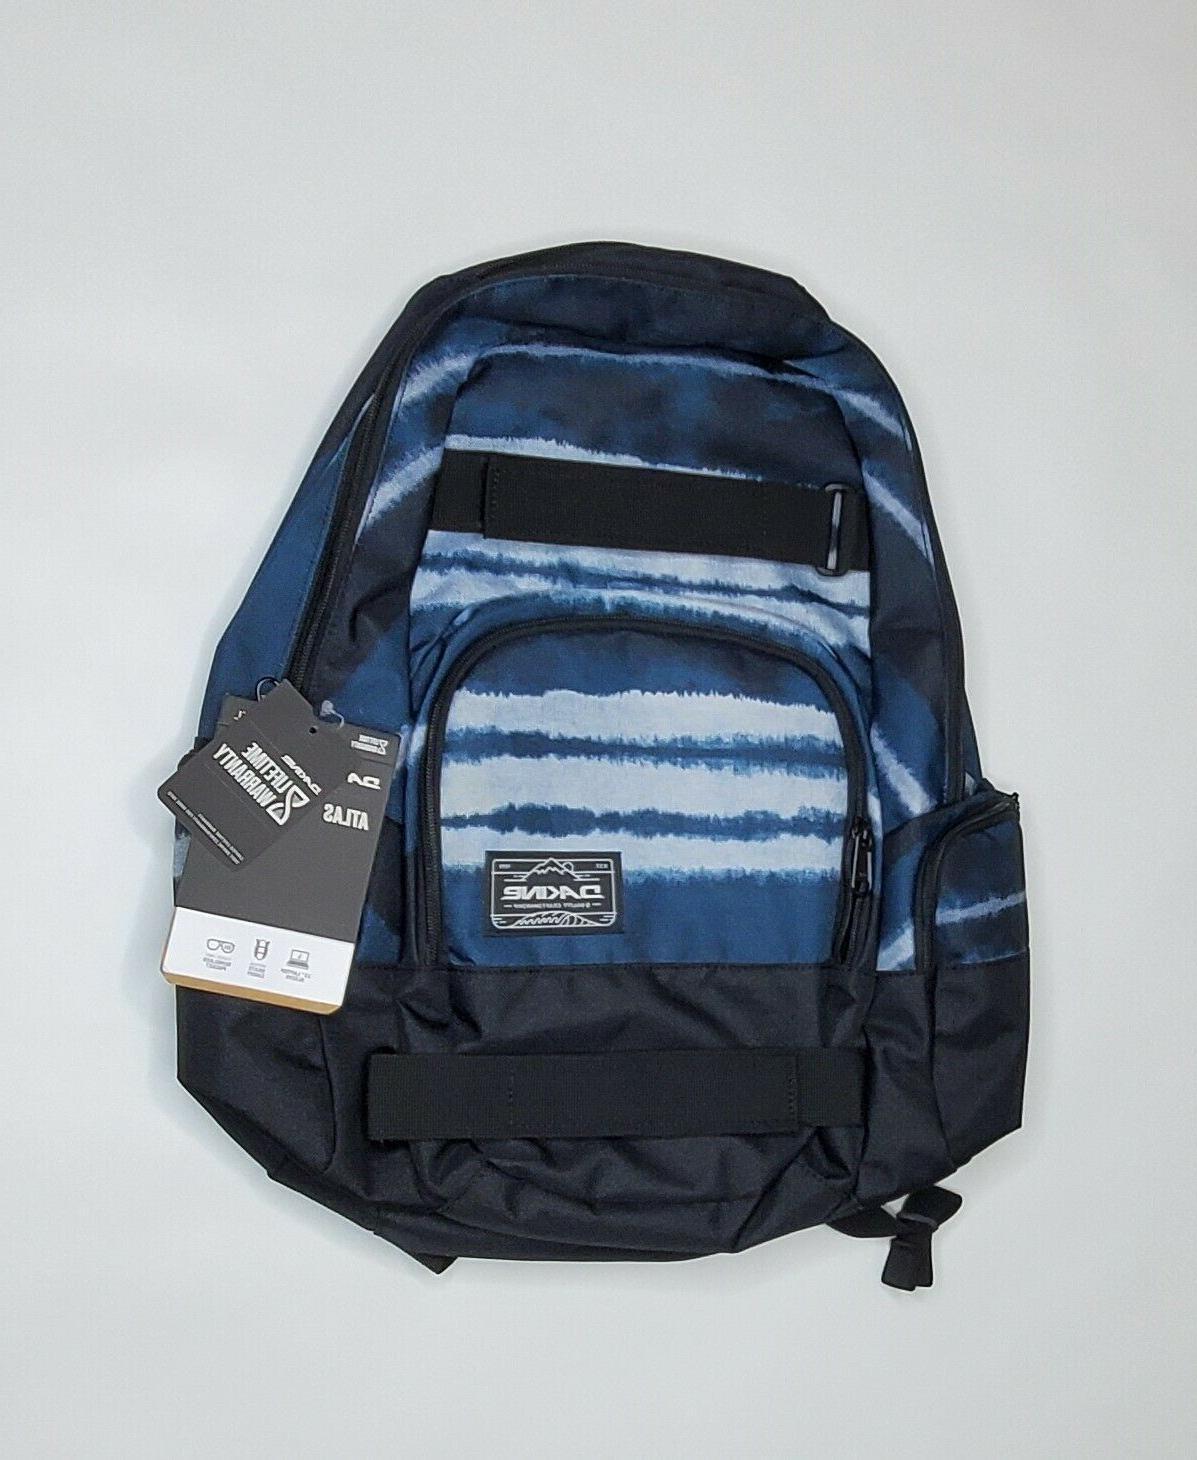 atlas backpack 25l skateboard carry straps laptop